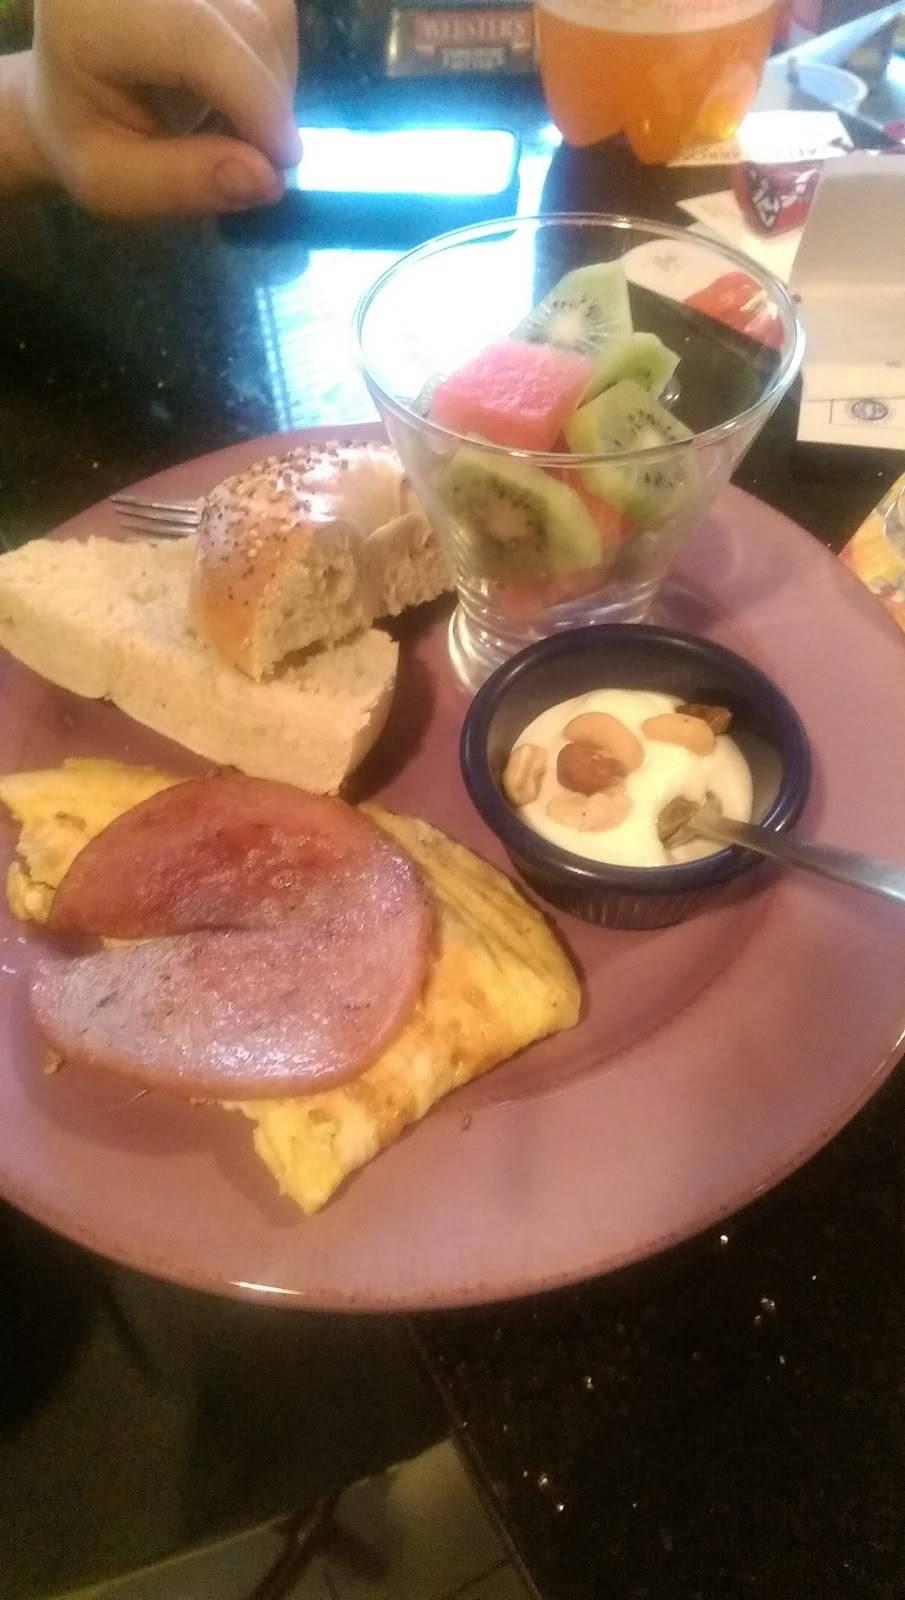 Sandellas | restaurant | 2641 John F. Kennedy Blvd, Jersey City, NJ 07306, USA | 2017617380 OR +1 201-761-7380